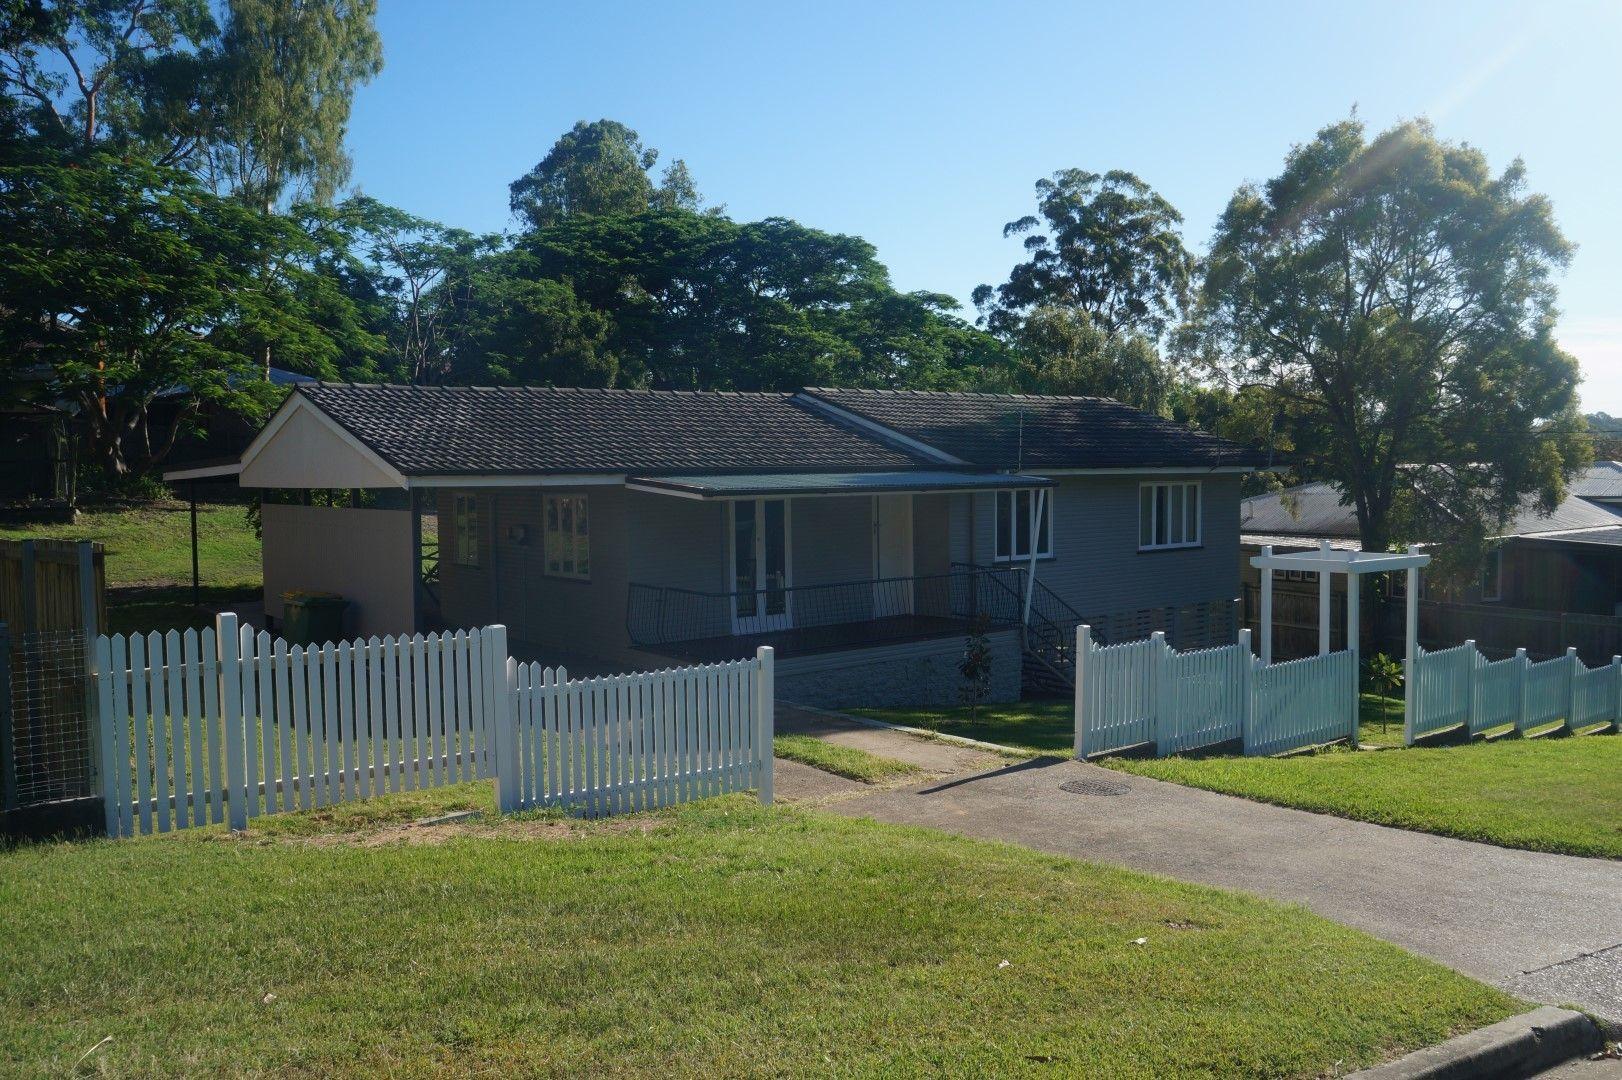 12 Chamberlain Street, Sadliers Crossing QLD 4305, Image 25